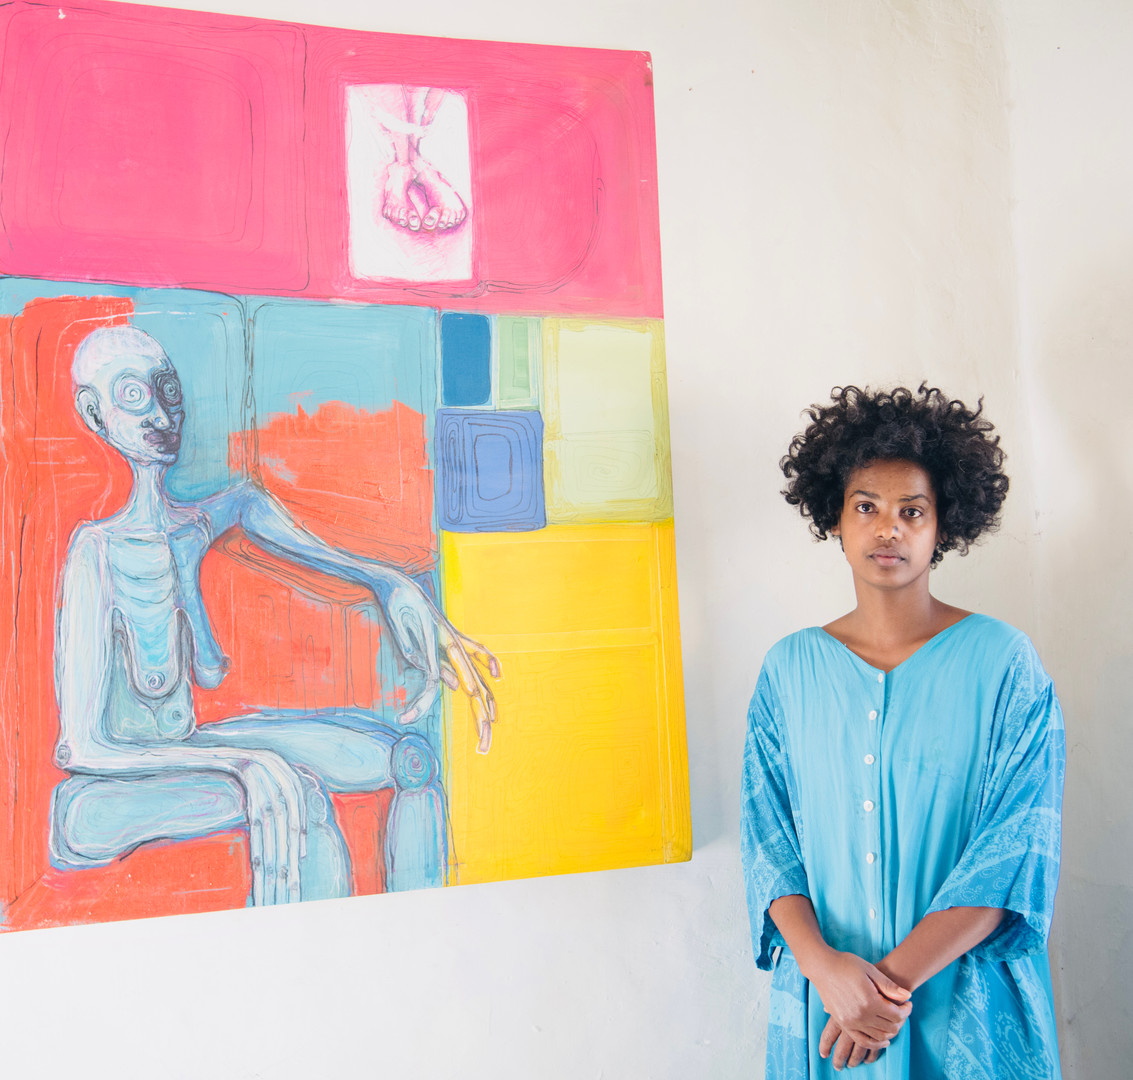 Free Art Felega Disrupt